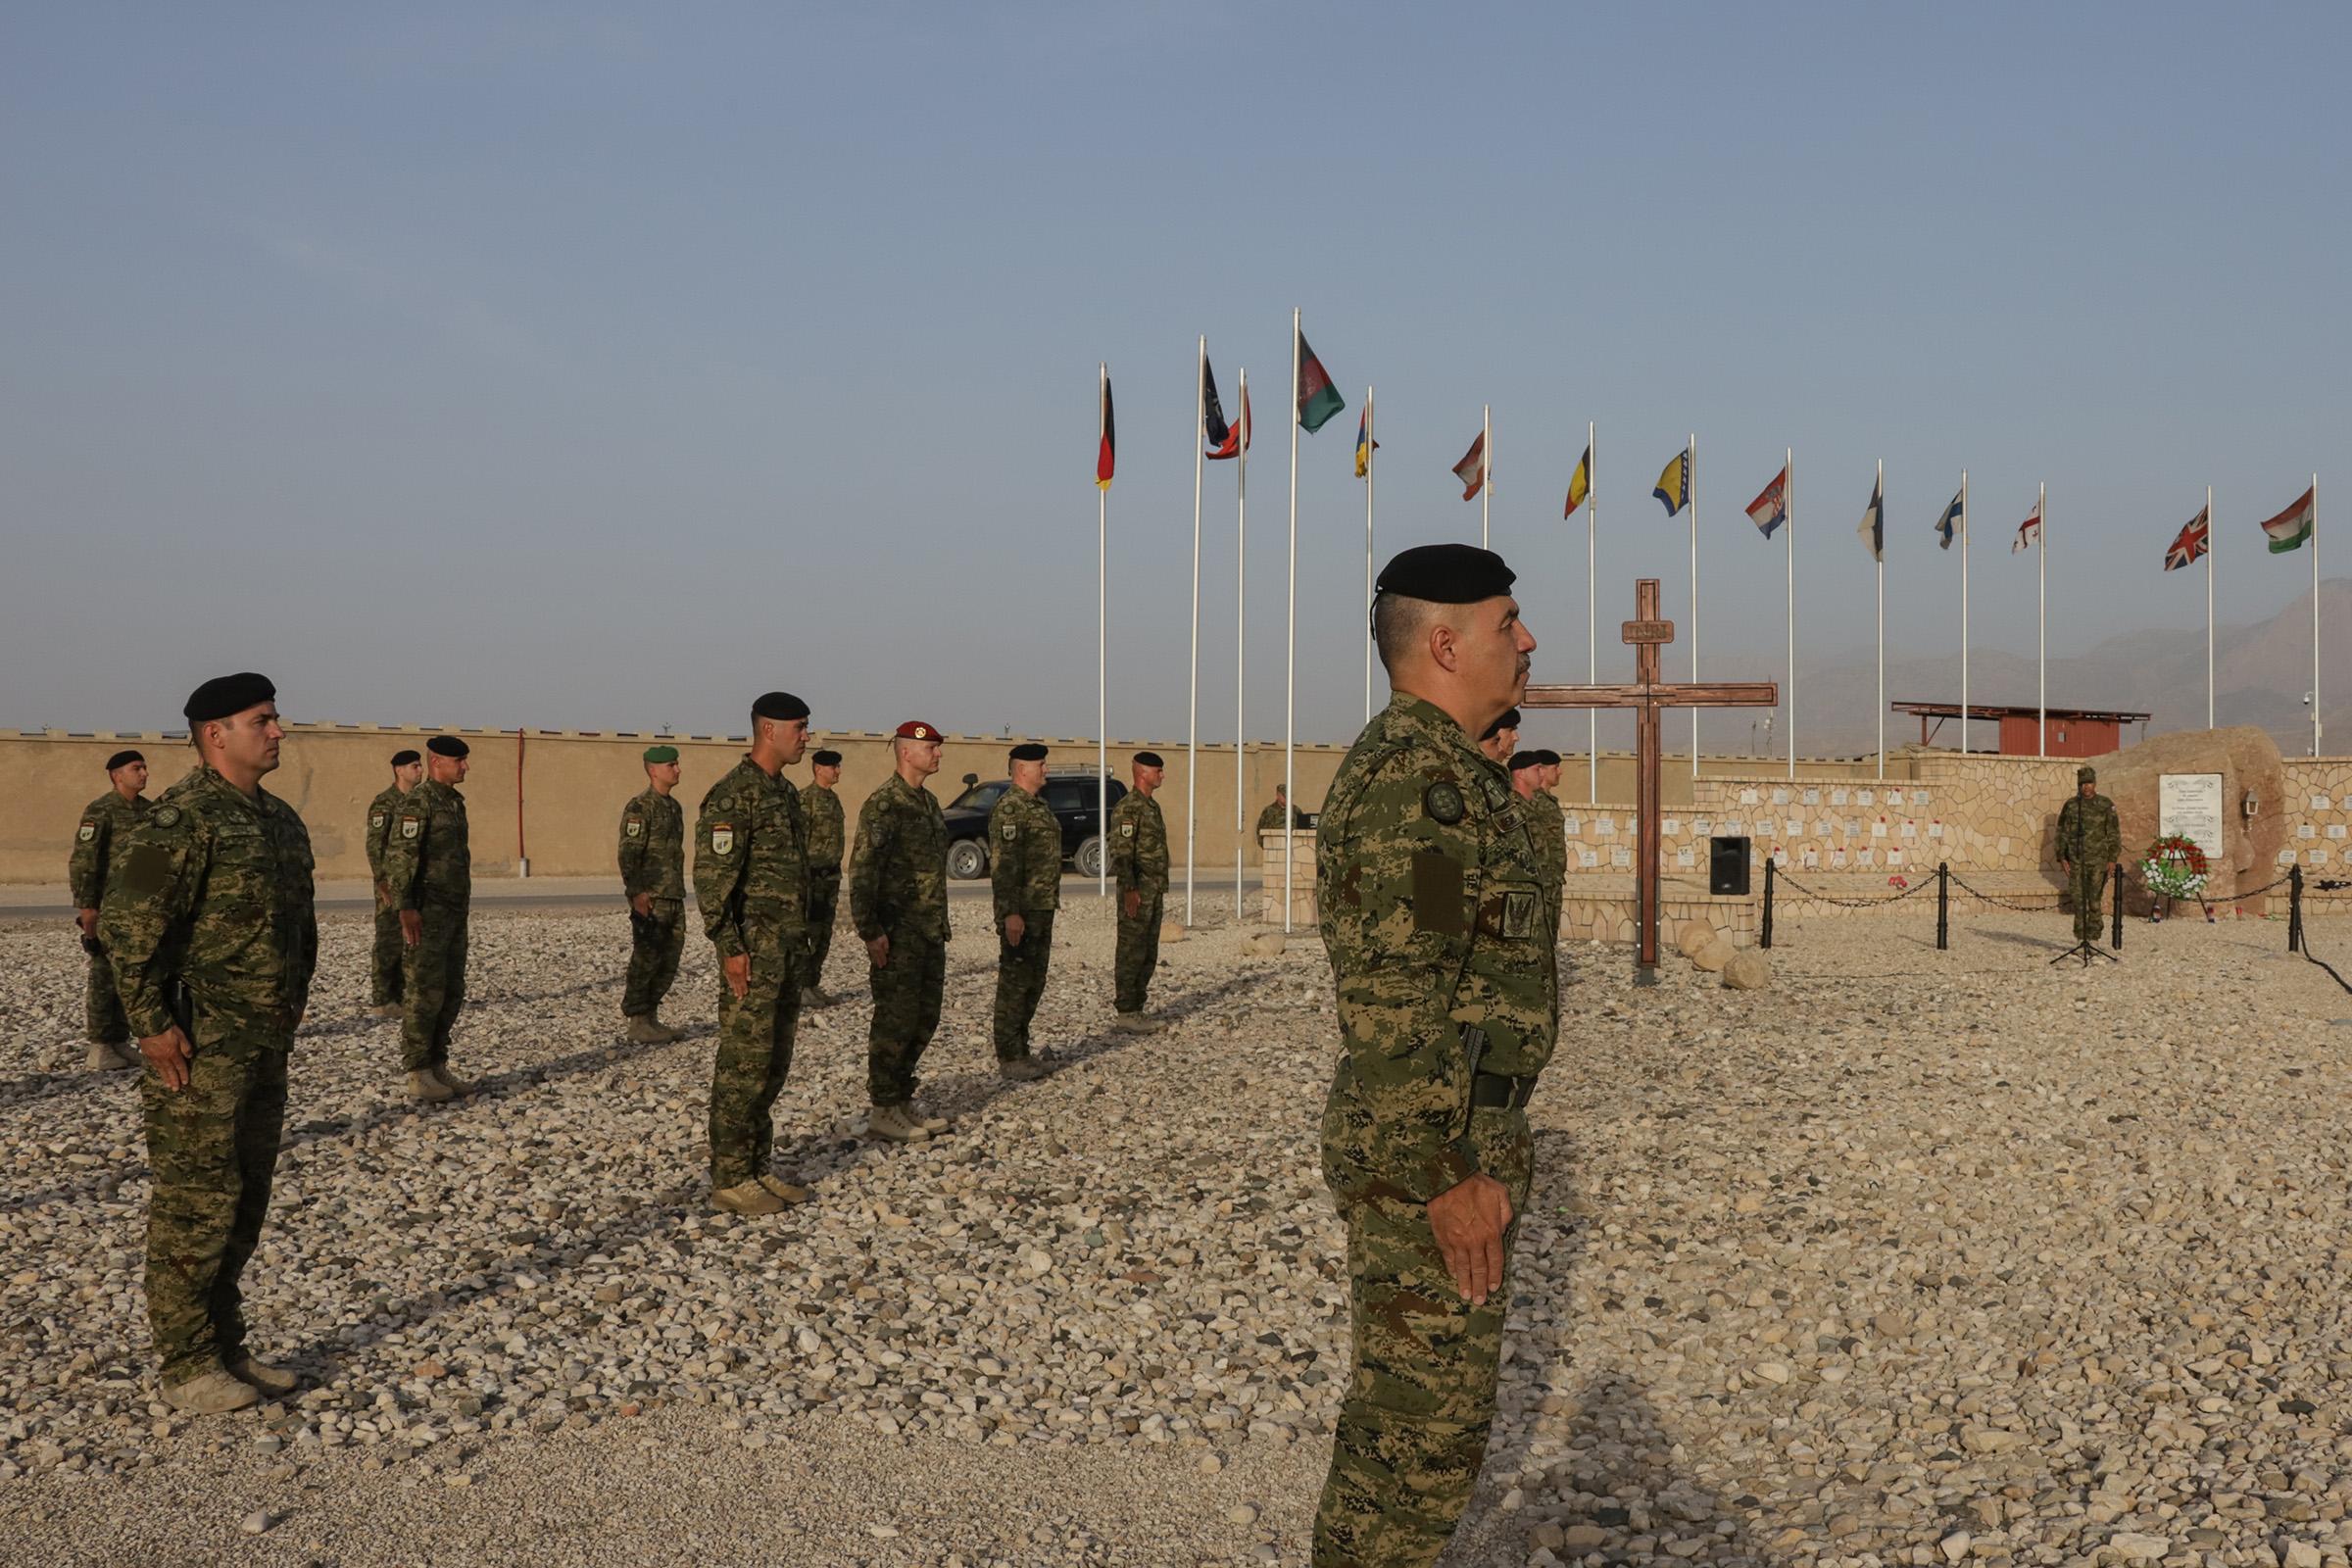 12. HRVCON obilježio Dan HV-a i HKoV-a te Dan državnosti u Afganistanu